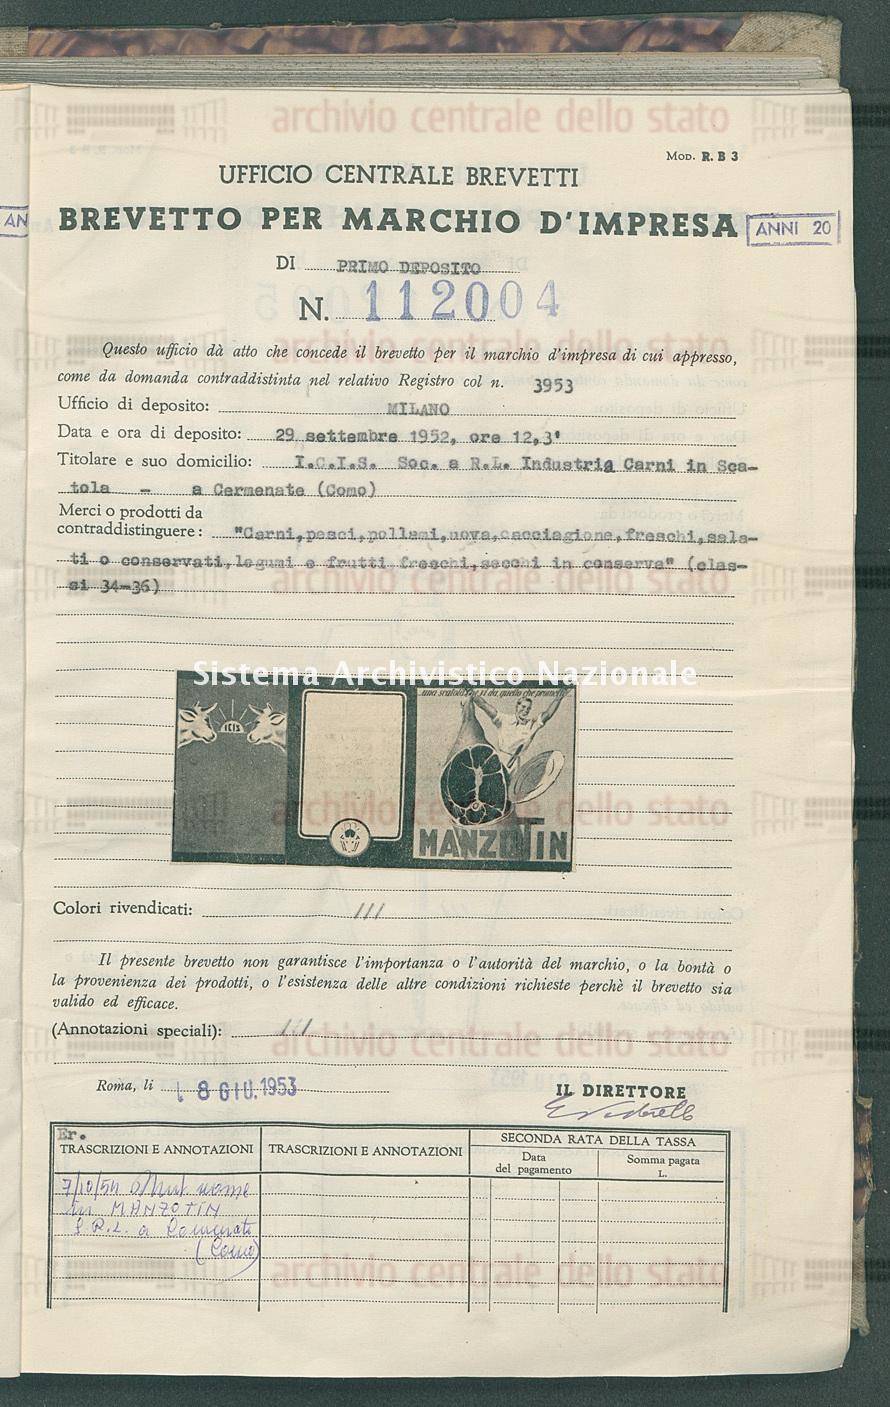 'Carni, pesci, pollami, uova, cacciagione, freschi, salati o conservat I.C.I.S.Soc. A R.L.Industria Carni In Scatola (08/06/1953)